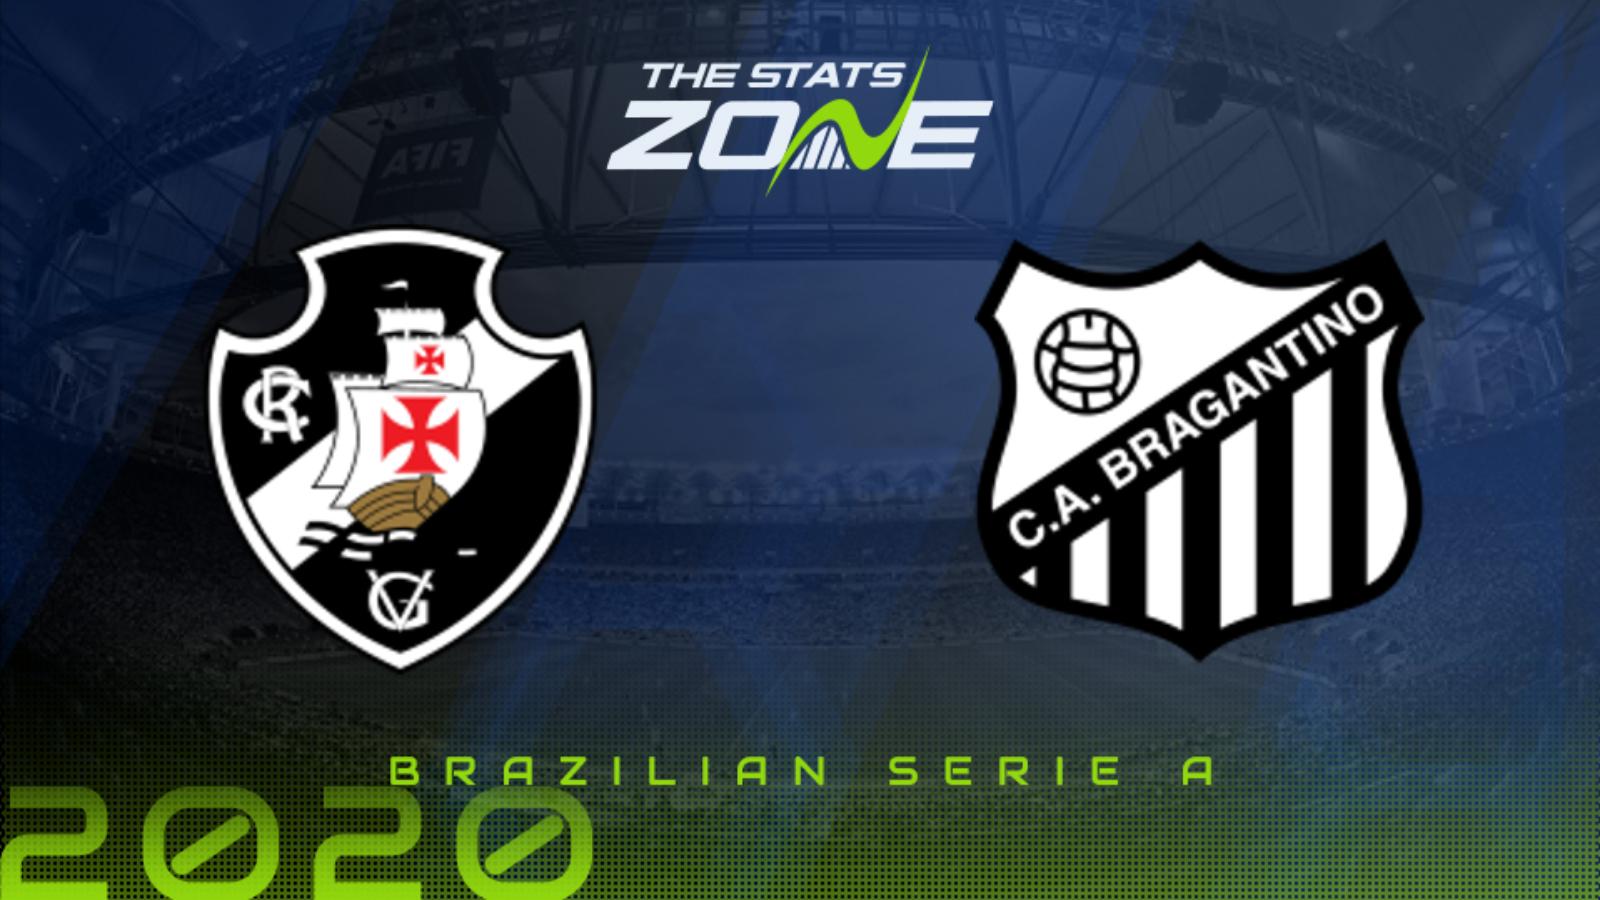 2020 Brazilian Serie A Vasco Da Gama Vs Rb Bragantino Preview Prediction The Stats Zone